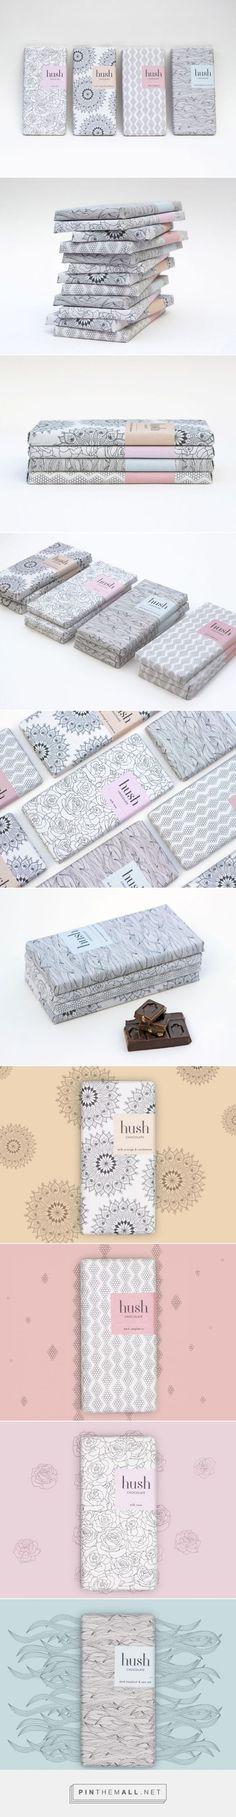 Hush Chocolate Packaging of the World - Creative Package Design Gallery - http://www.packagingoftheworld.com/2016/01/hush-chocolate.html